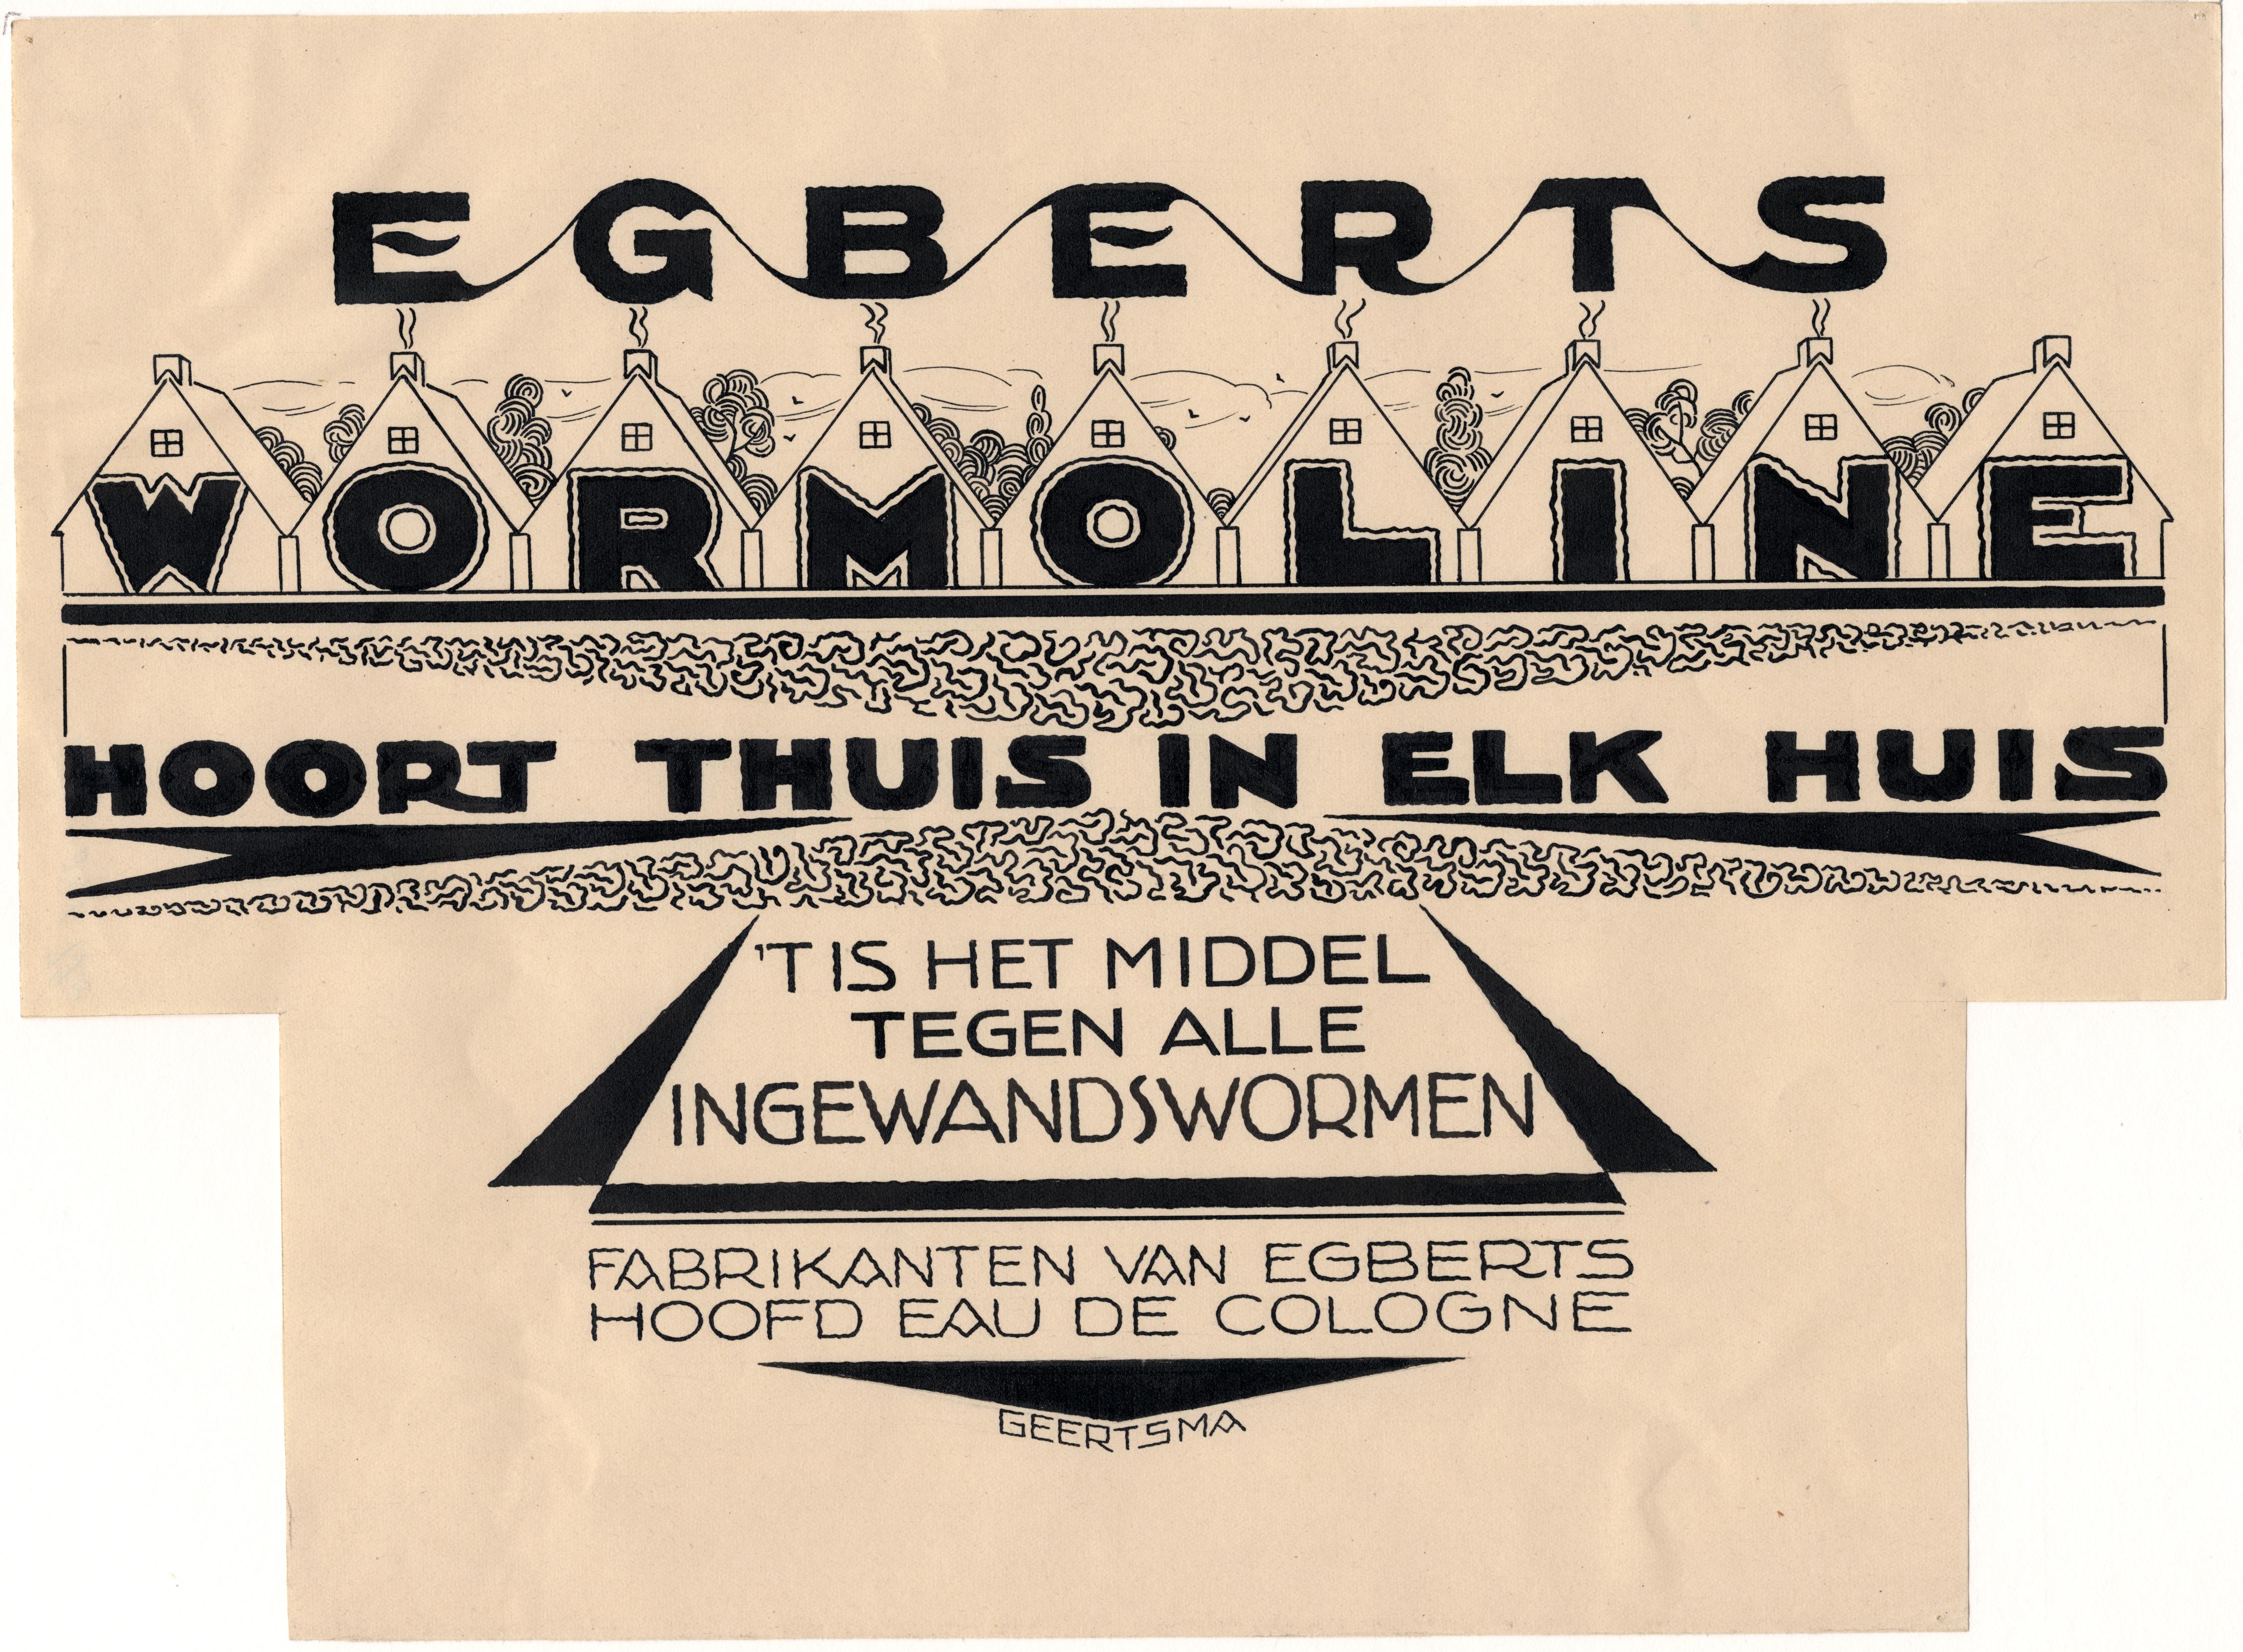 Egberts Wormoline